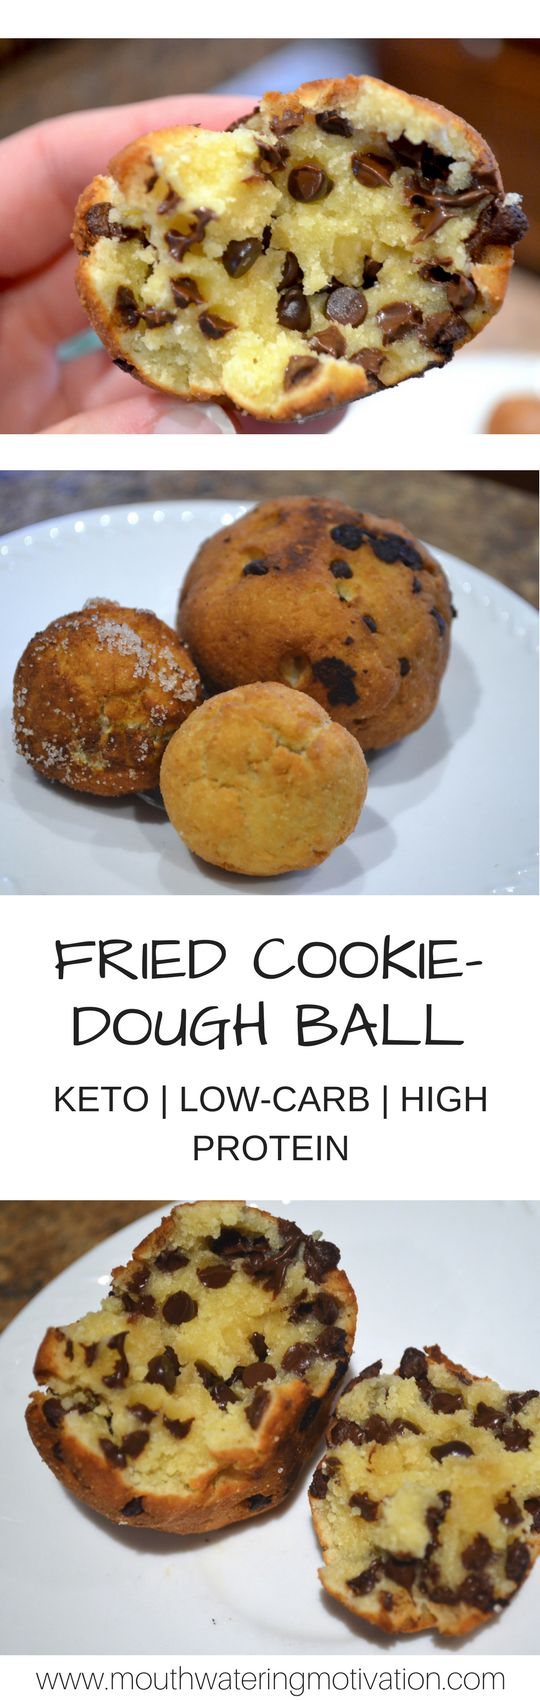 Fried Keto Cookie Dough Ball #lowcarb #keto #chocolatechipcookies #coconutoil